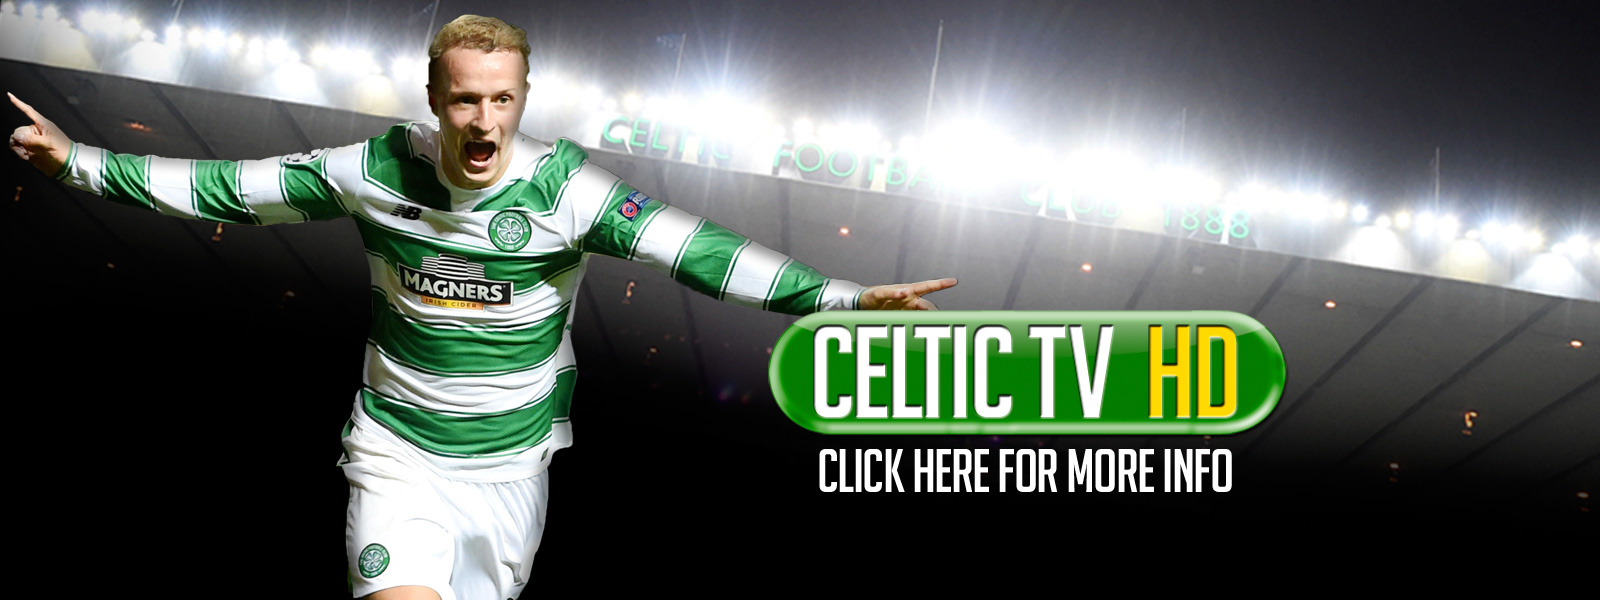 CelticTV